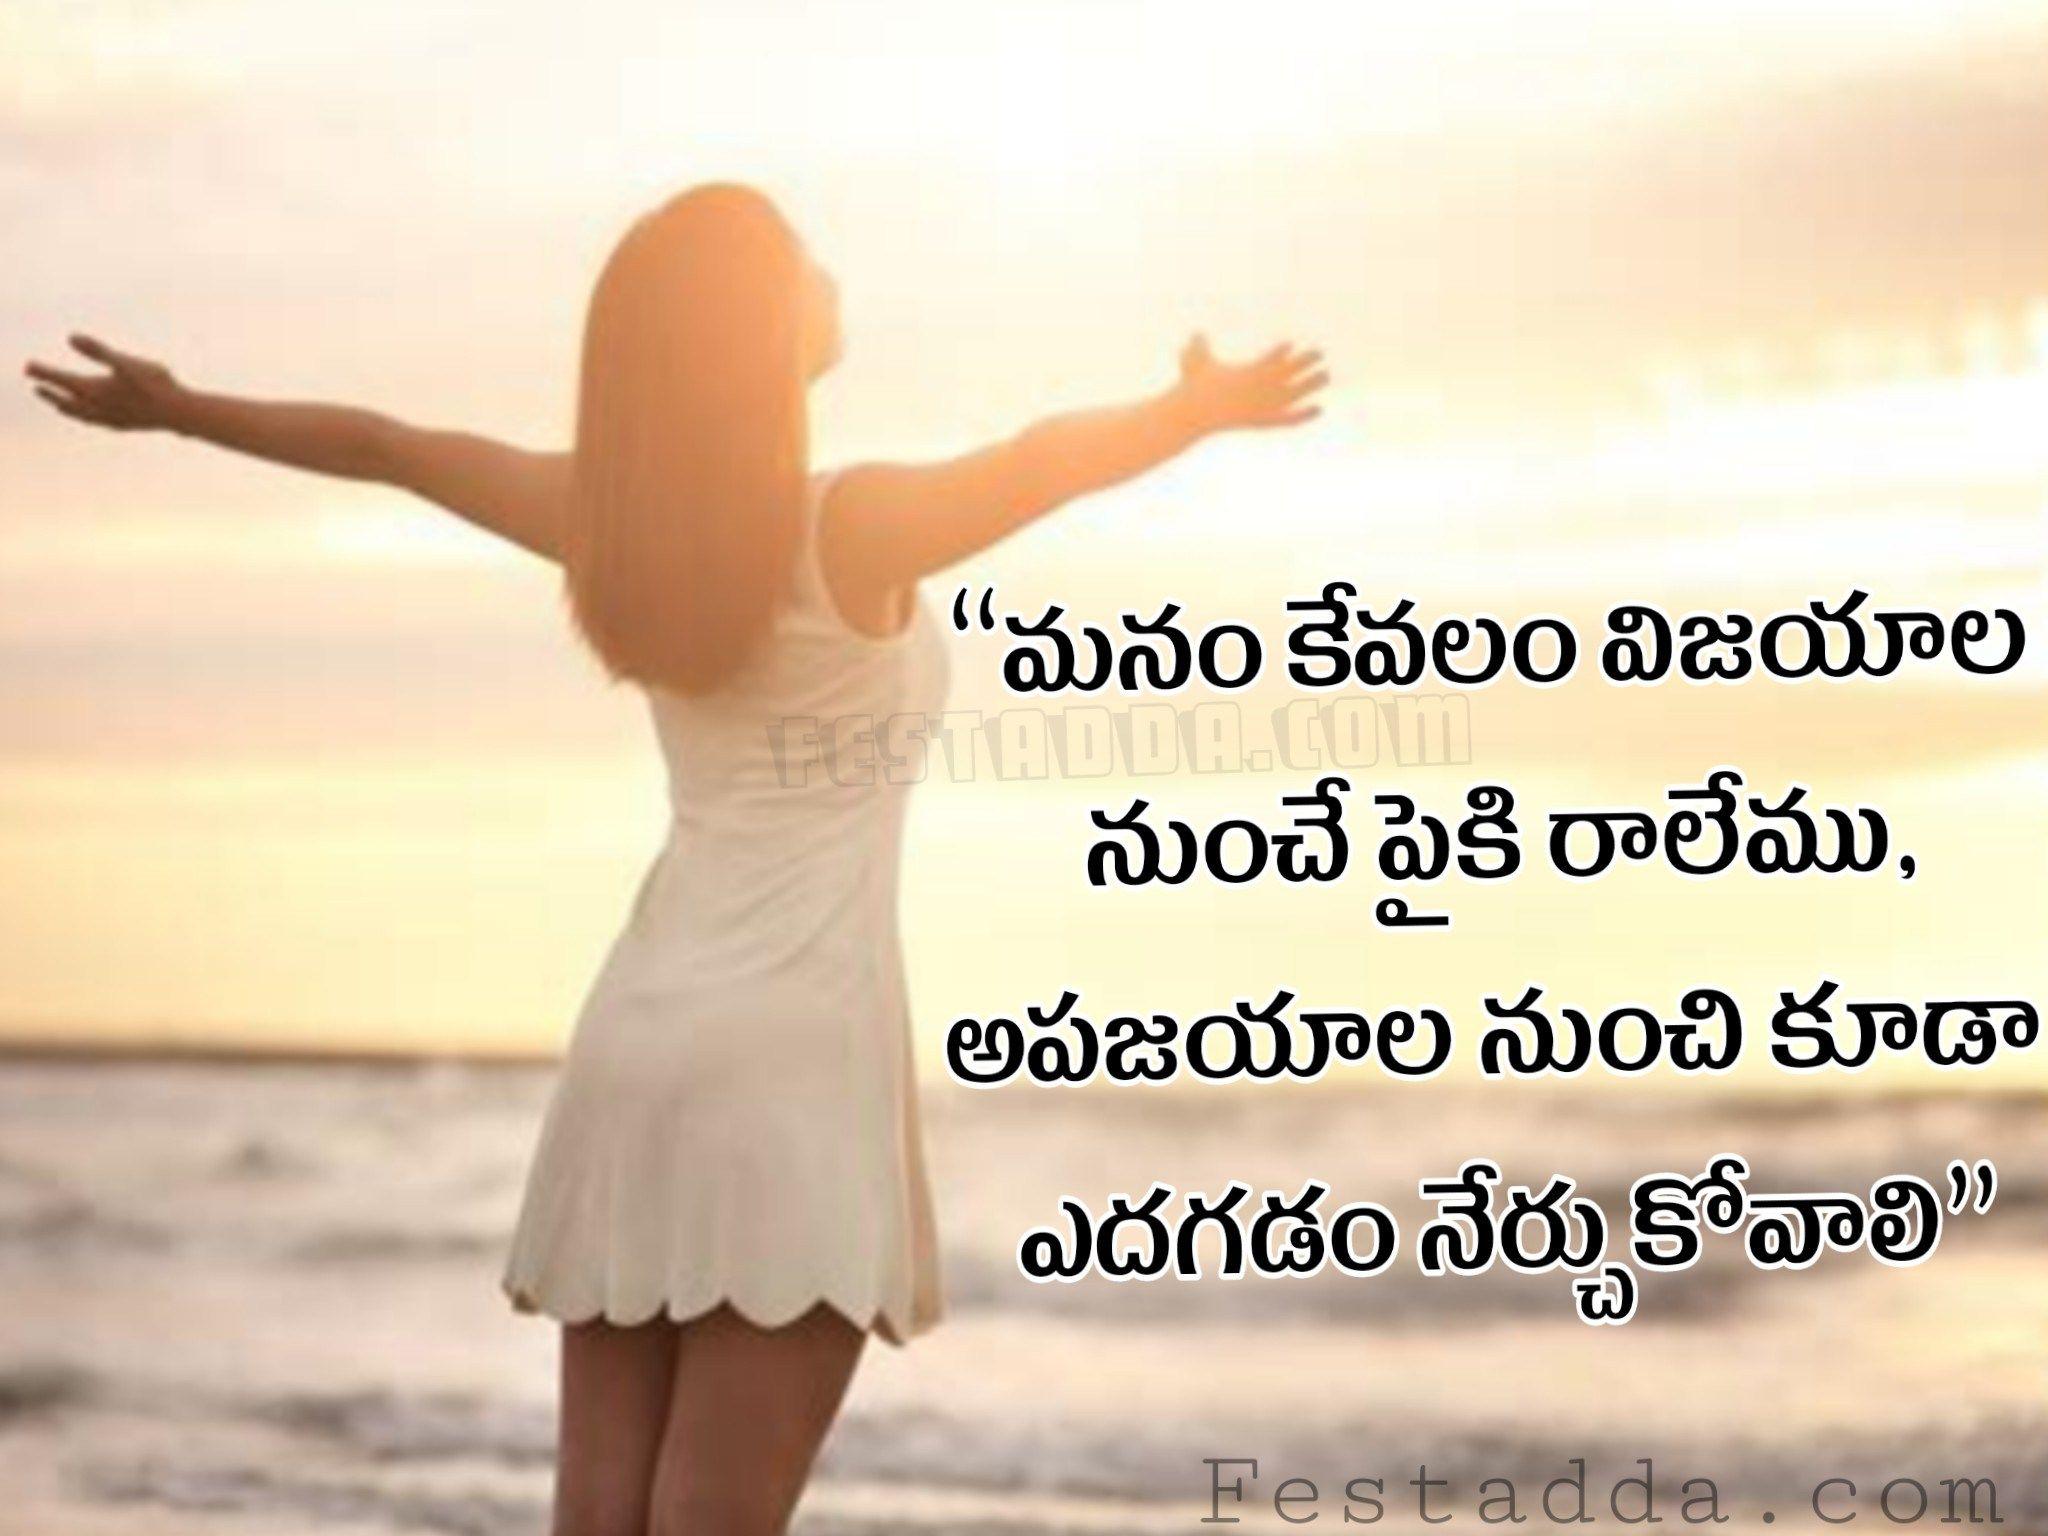 Namakam Quotes In Telugu Successful Life Quotes Quotations Success Images